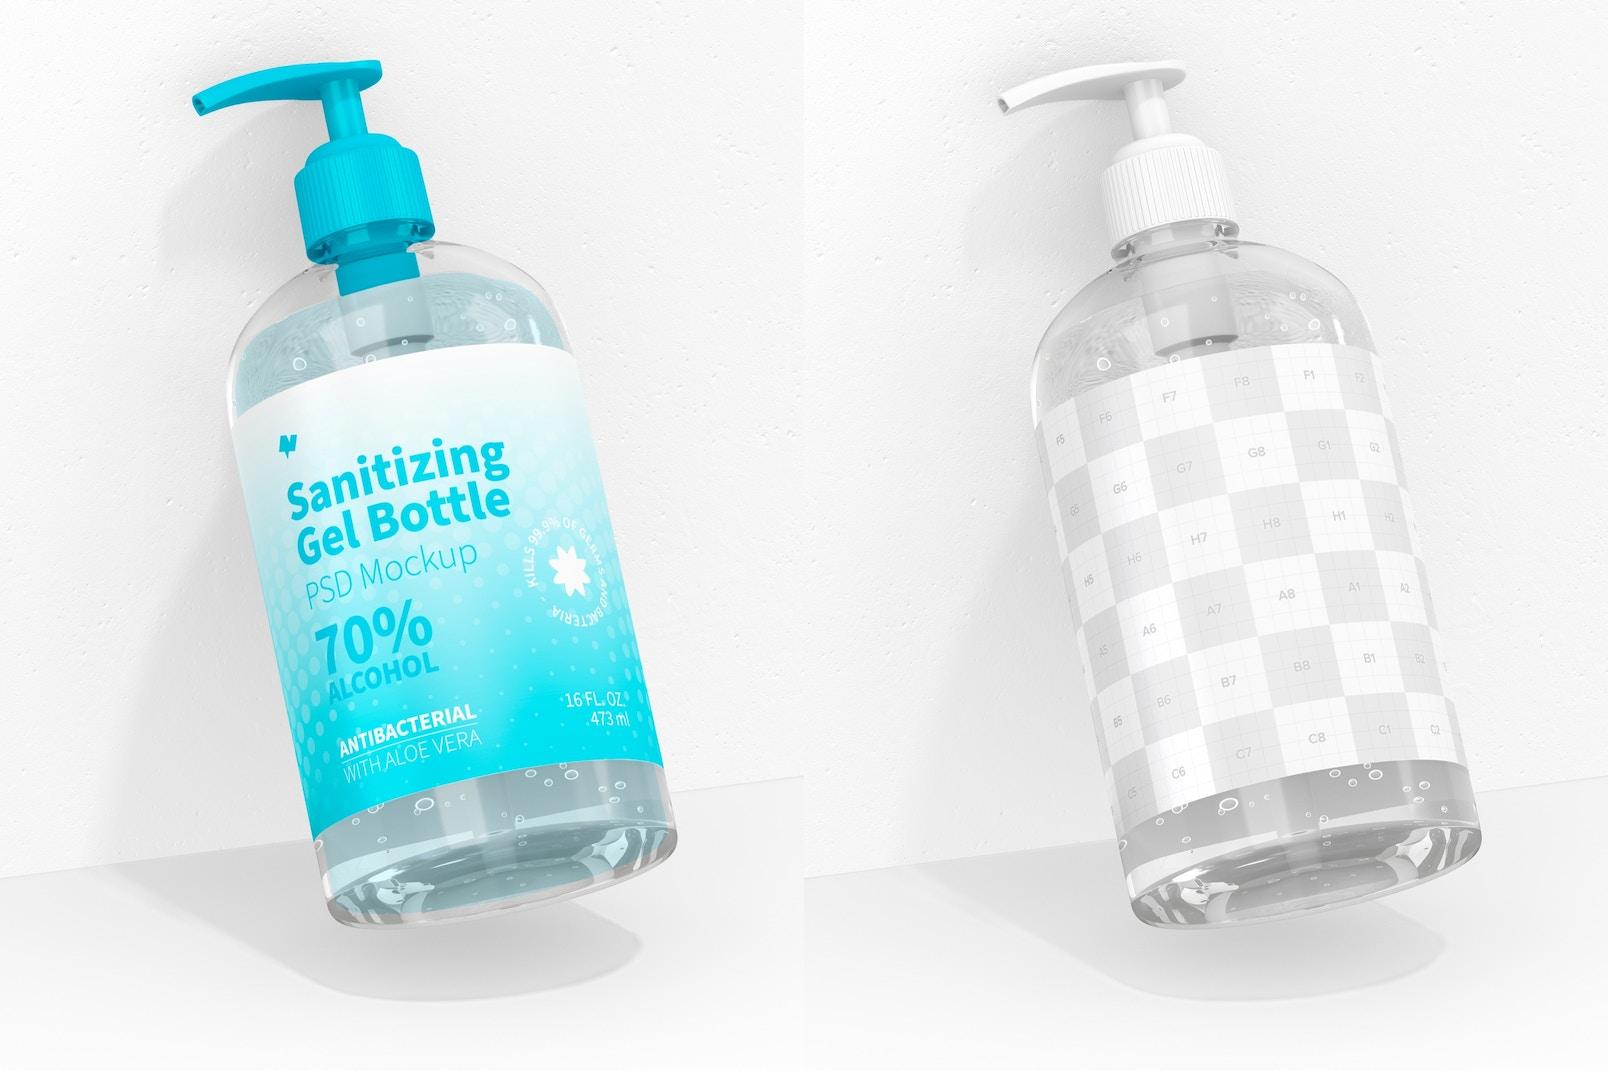 16 oz Sanitizing Gel Bottle Mockup, Leaned